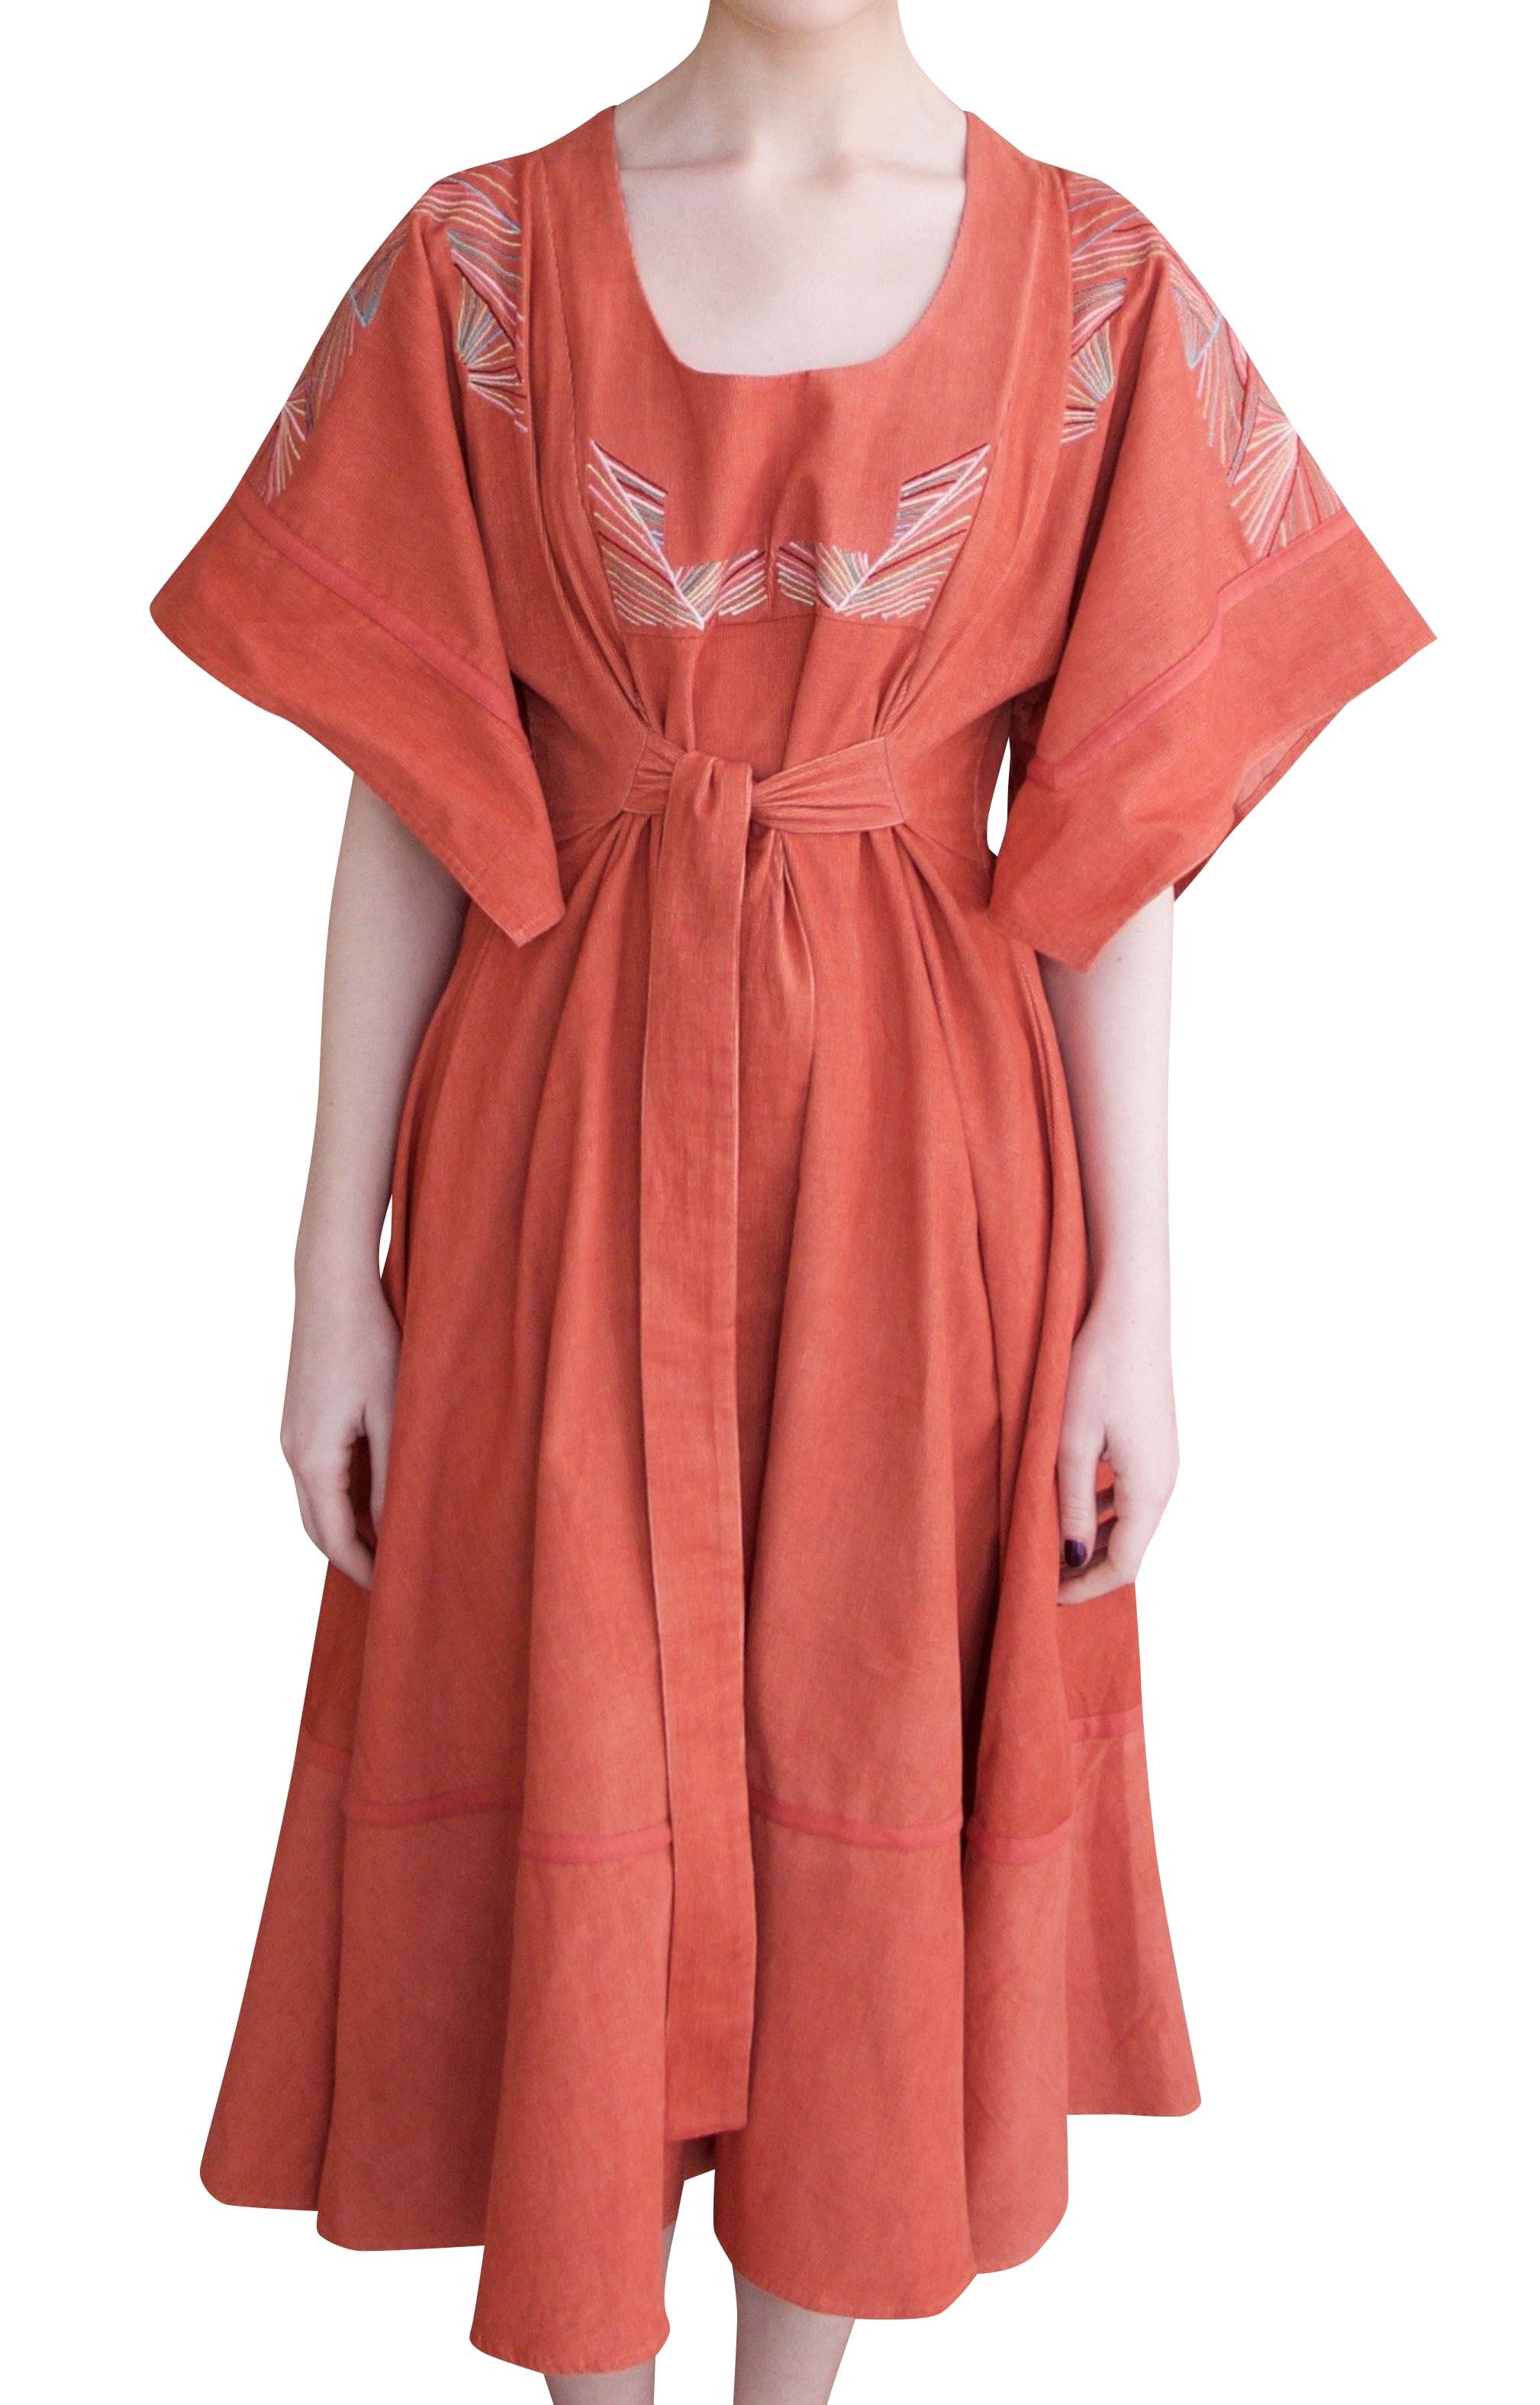 Barbara midi dress Terracotta by Tallulah & Hope - 1